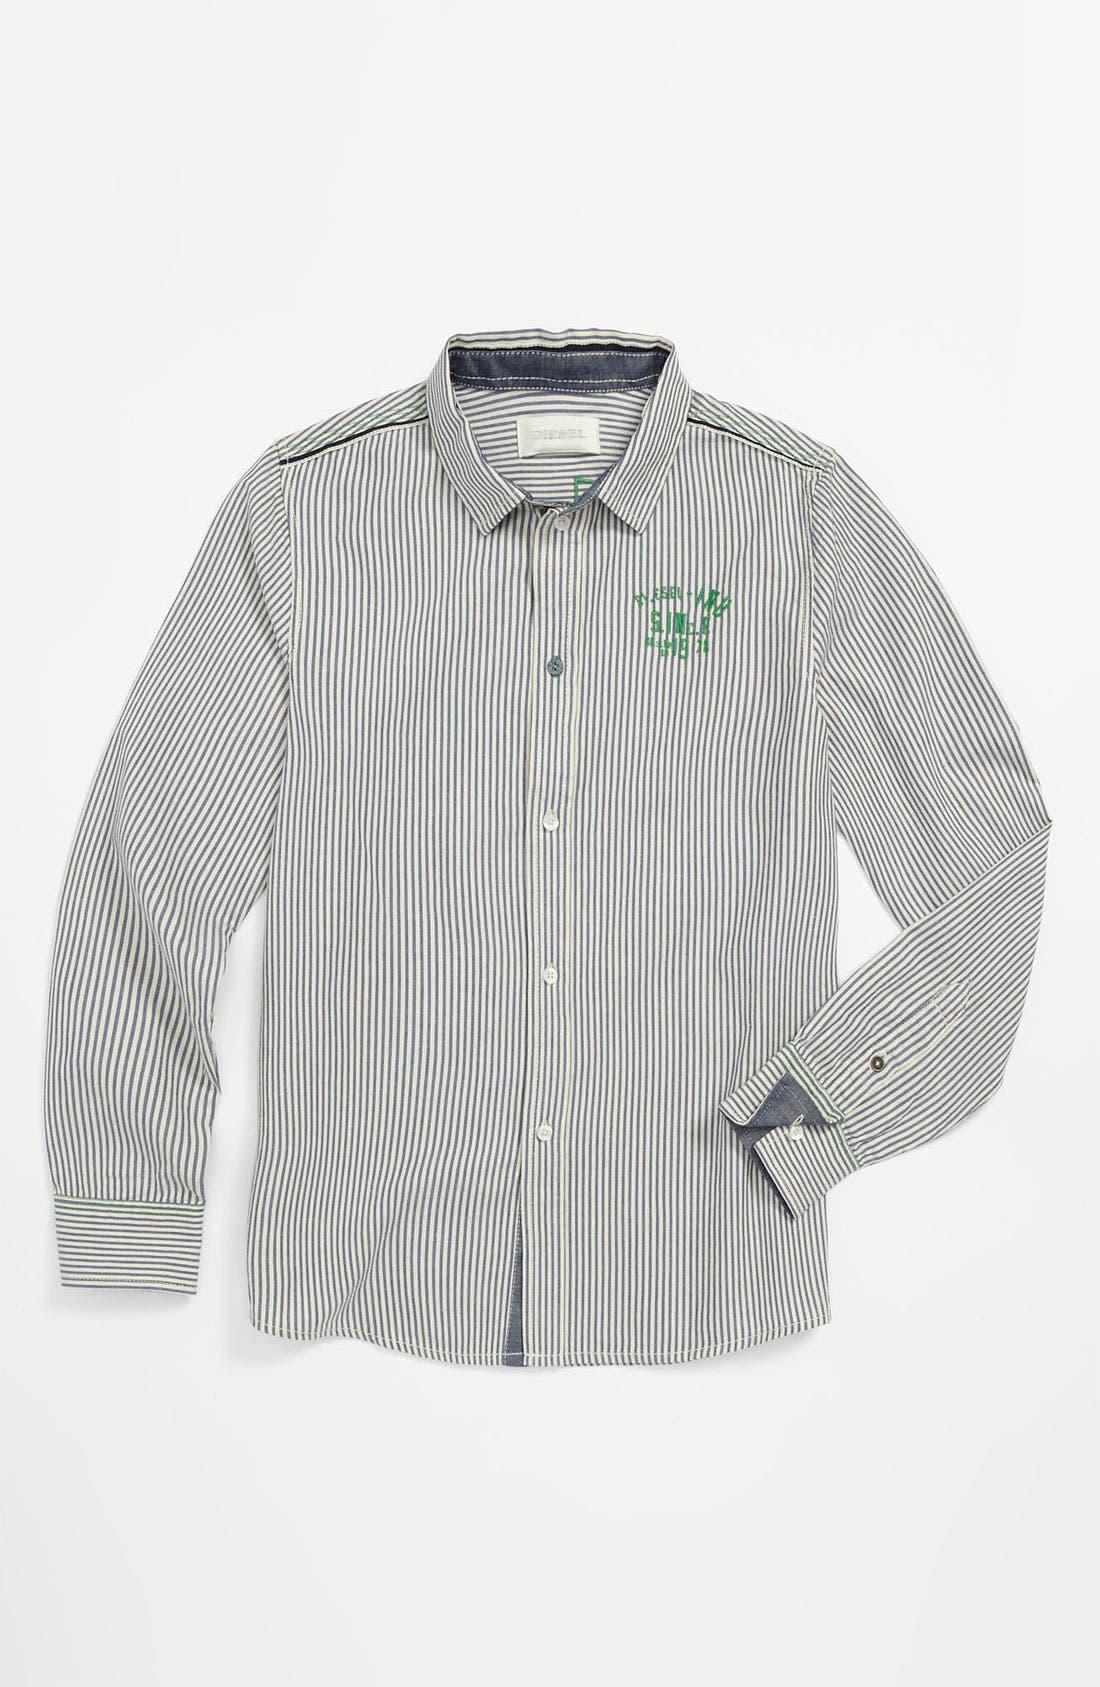 Alternate Image 1 Selected - DIESEL® 'Caixi' Shirt (Big Boys)